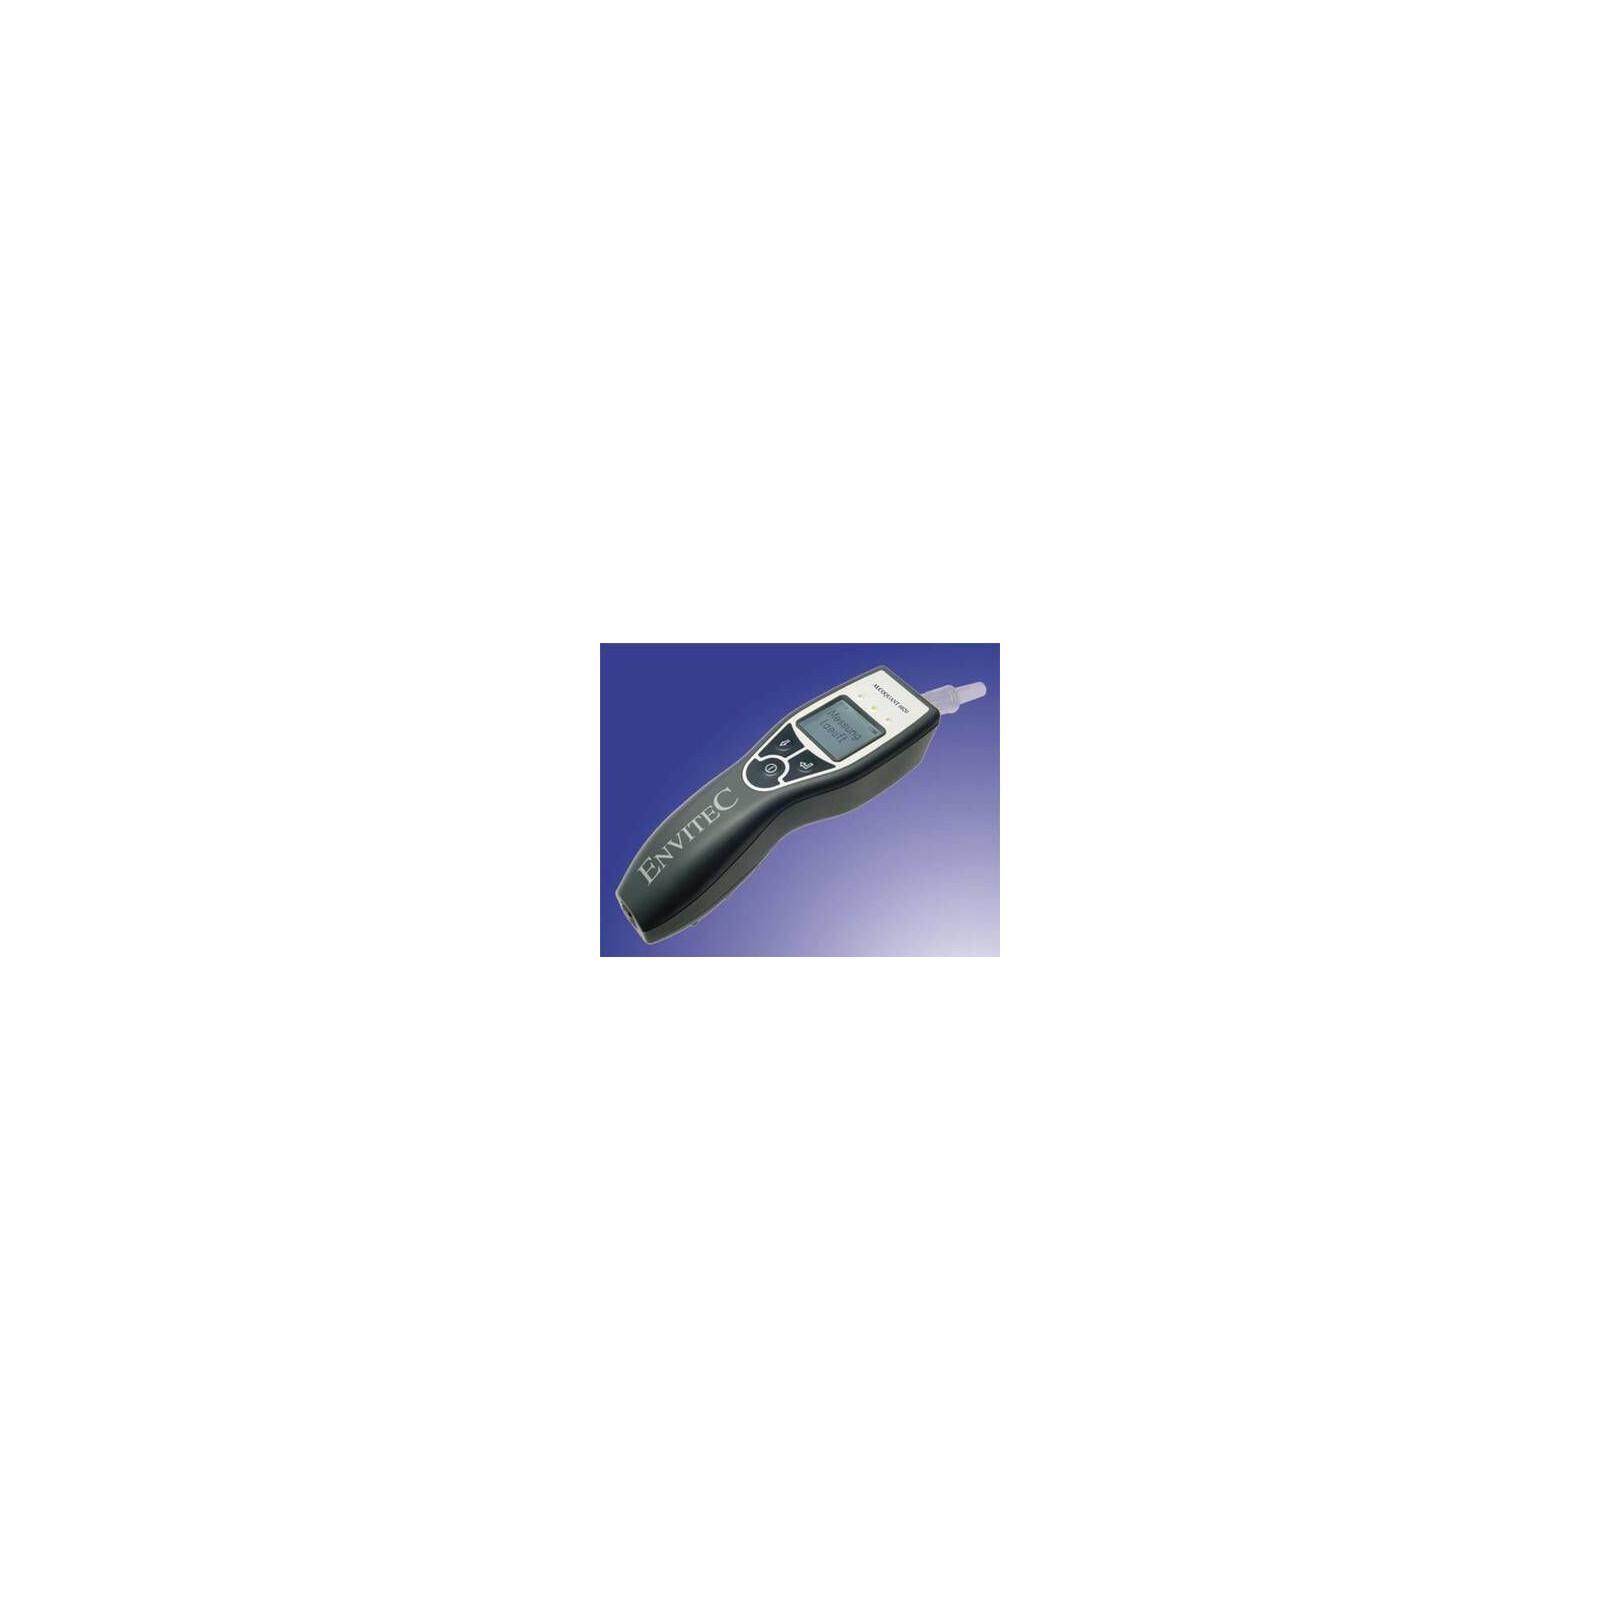 Envitec Alcoquant 6020 plus Alkomat Atemalkoholtestgerät